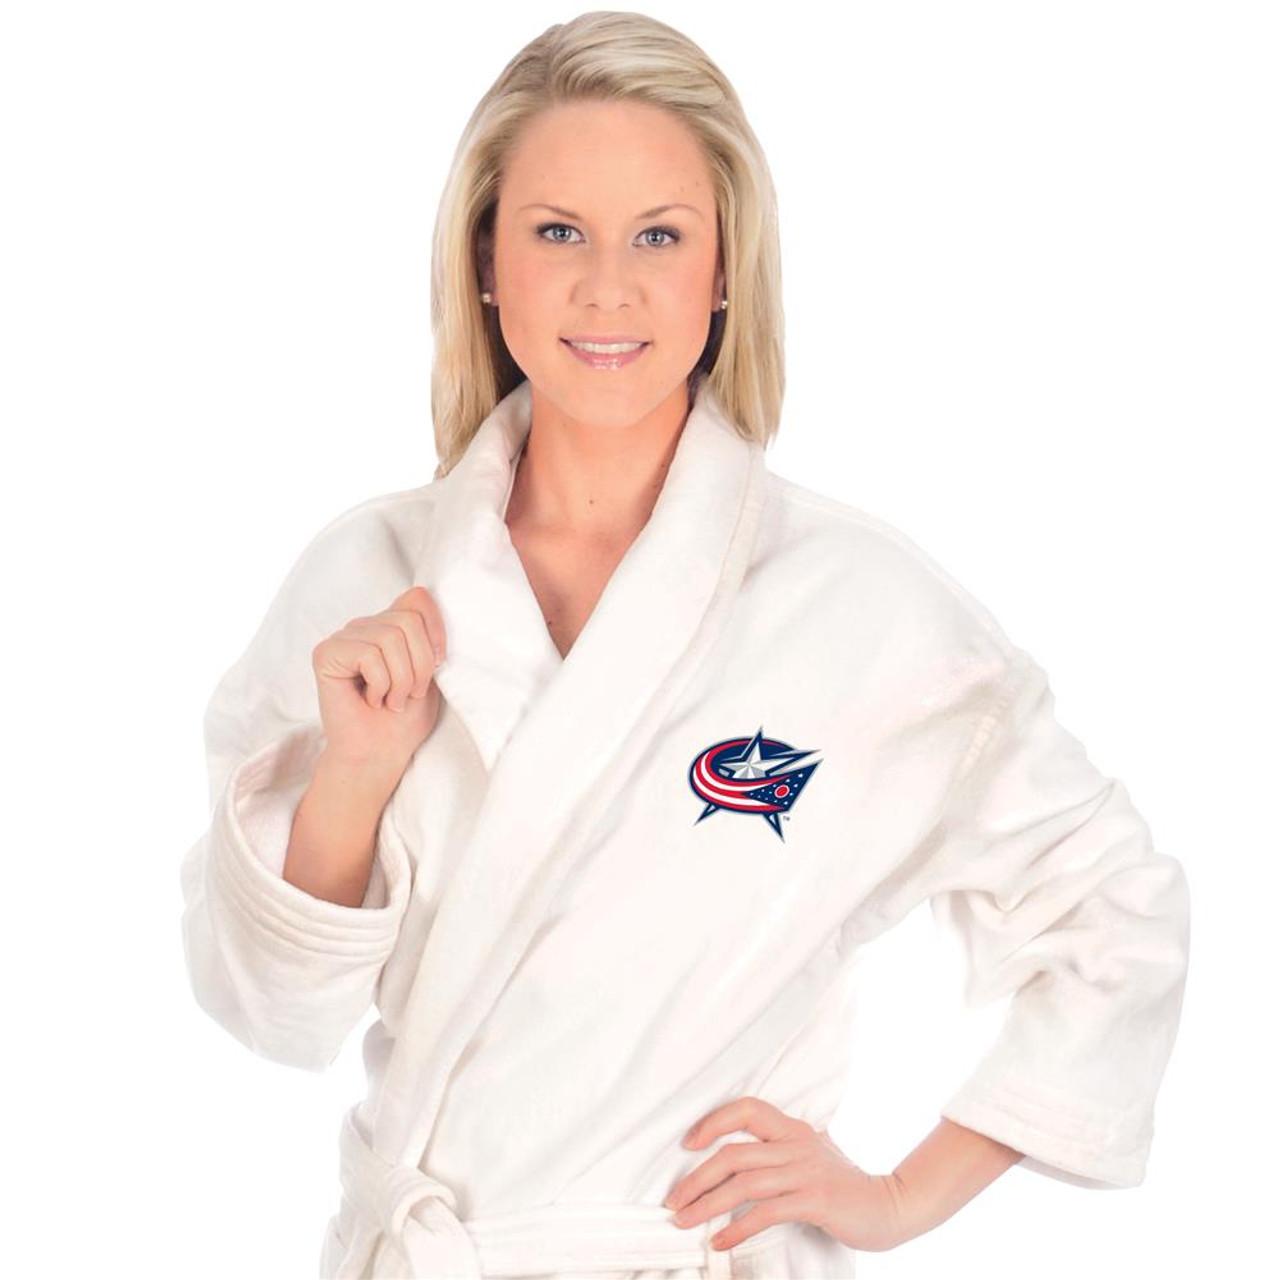 Columbus Blue Jackets Heavy Weight Bath Robe White House Coat